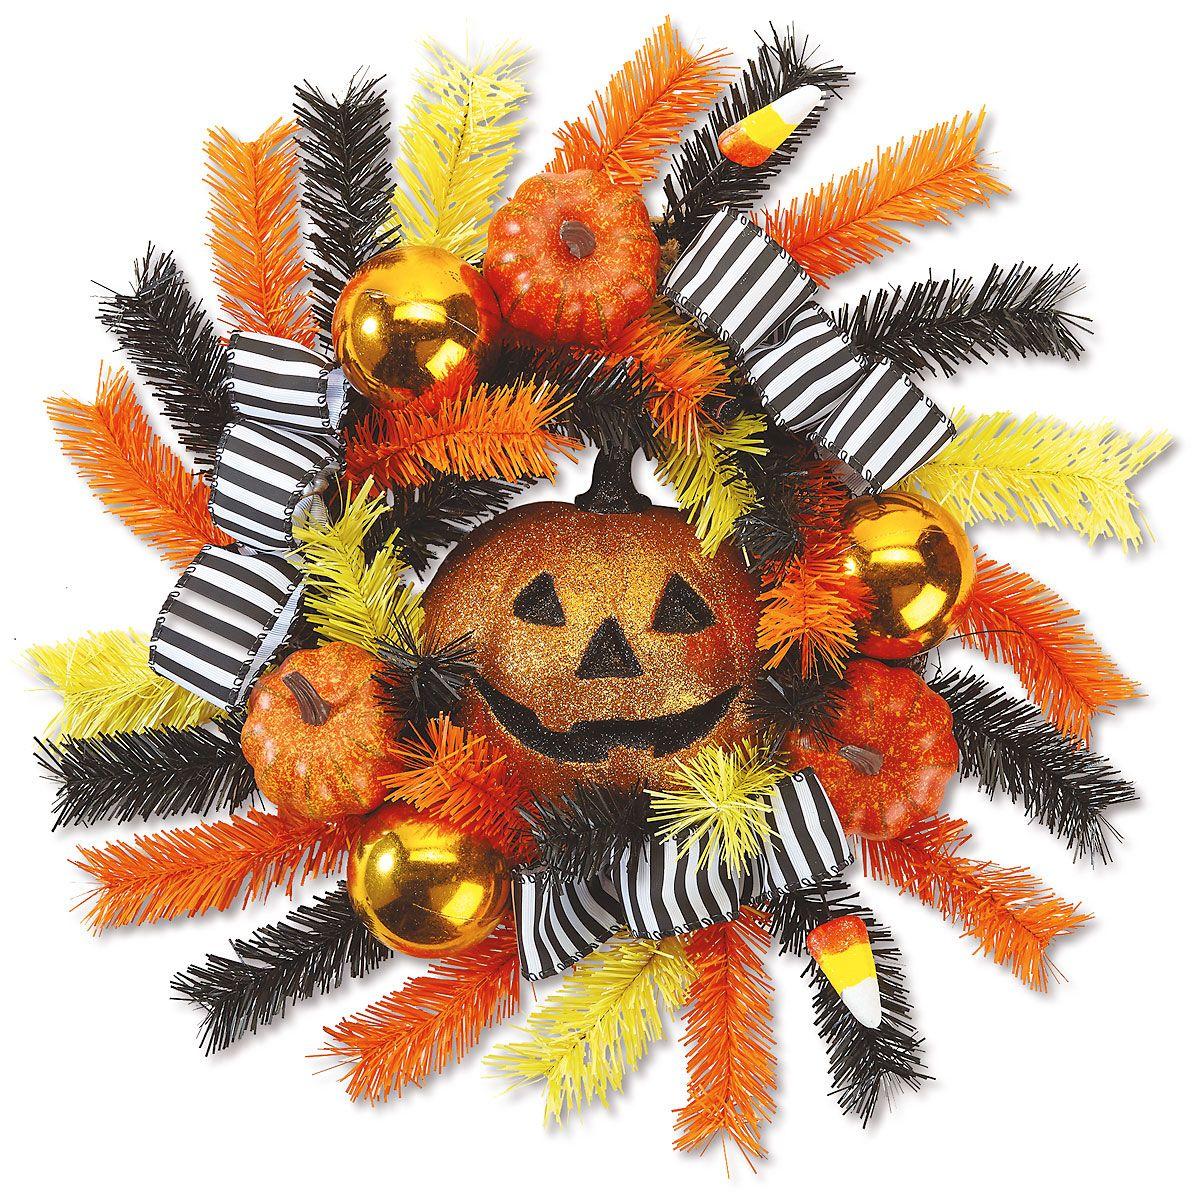 Jack-o'-Lantern Wreath